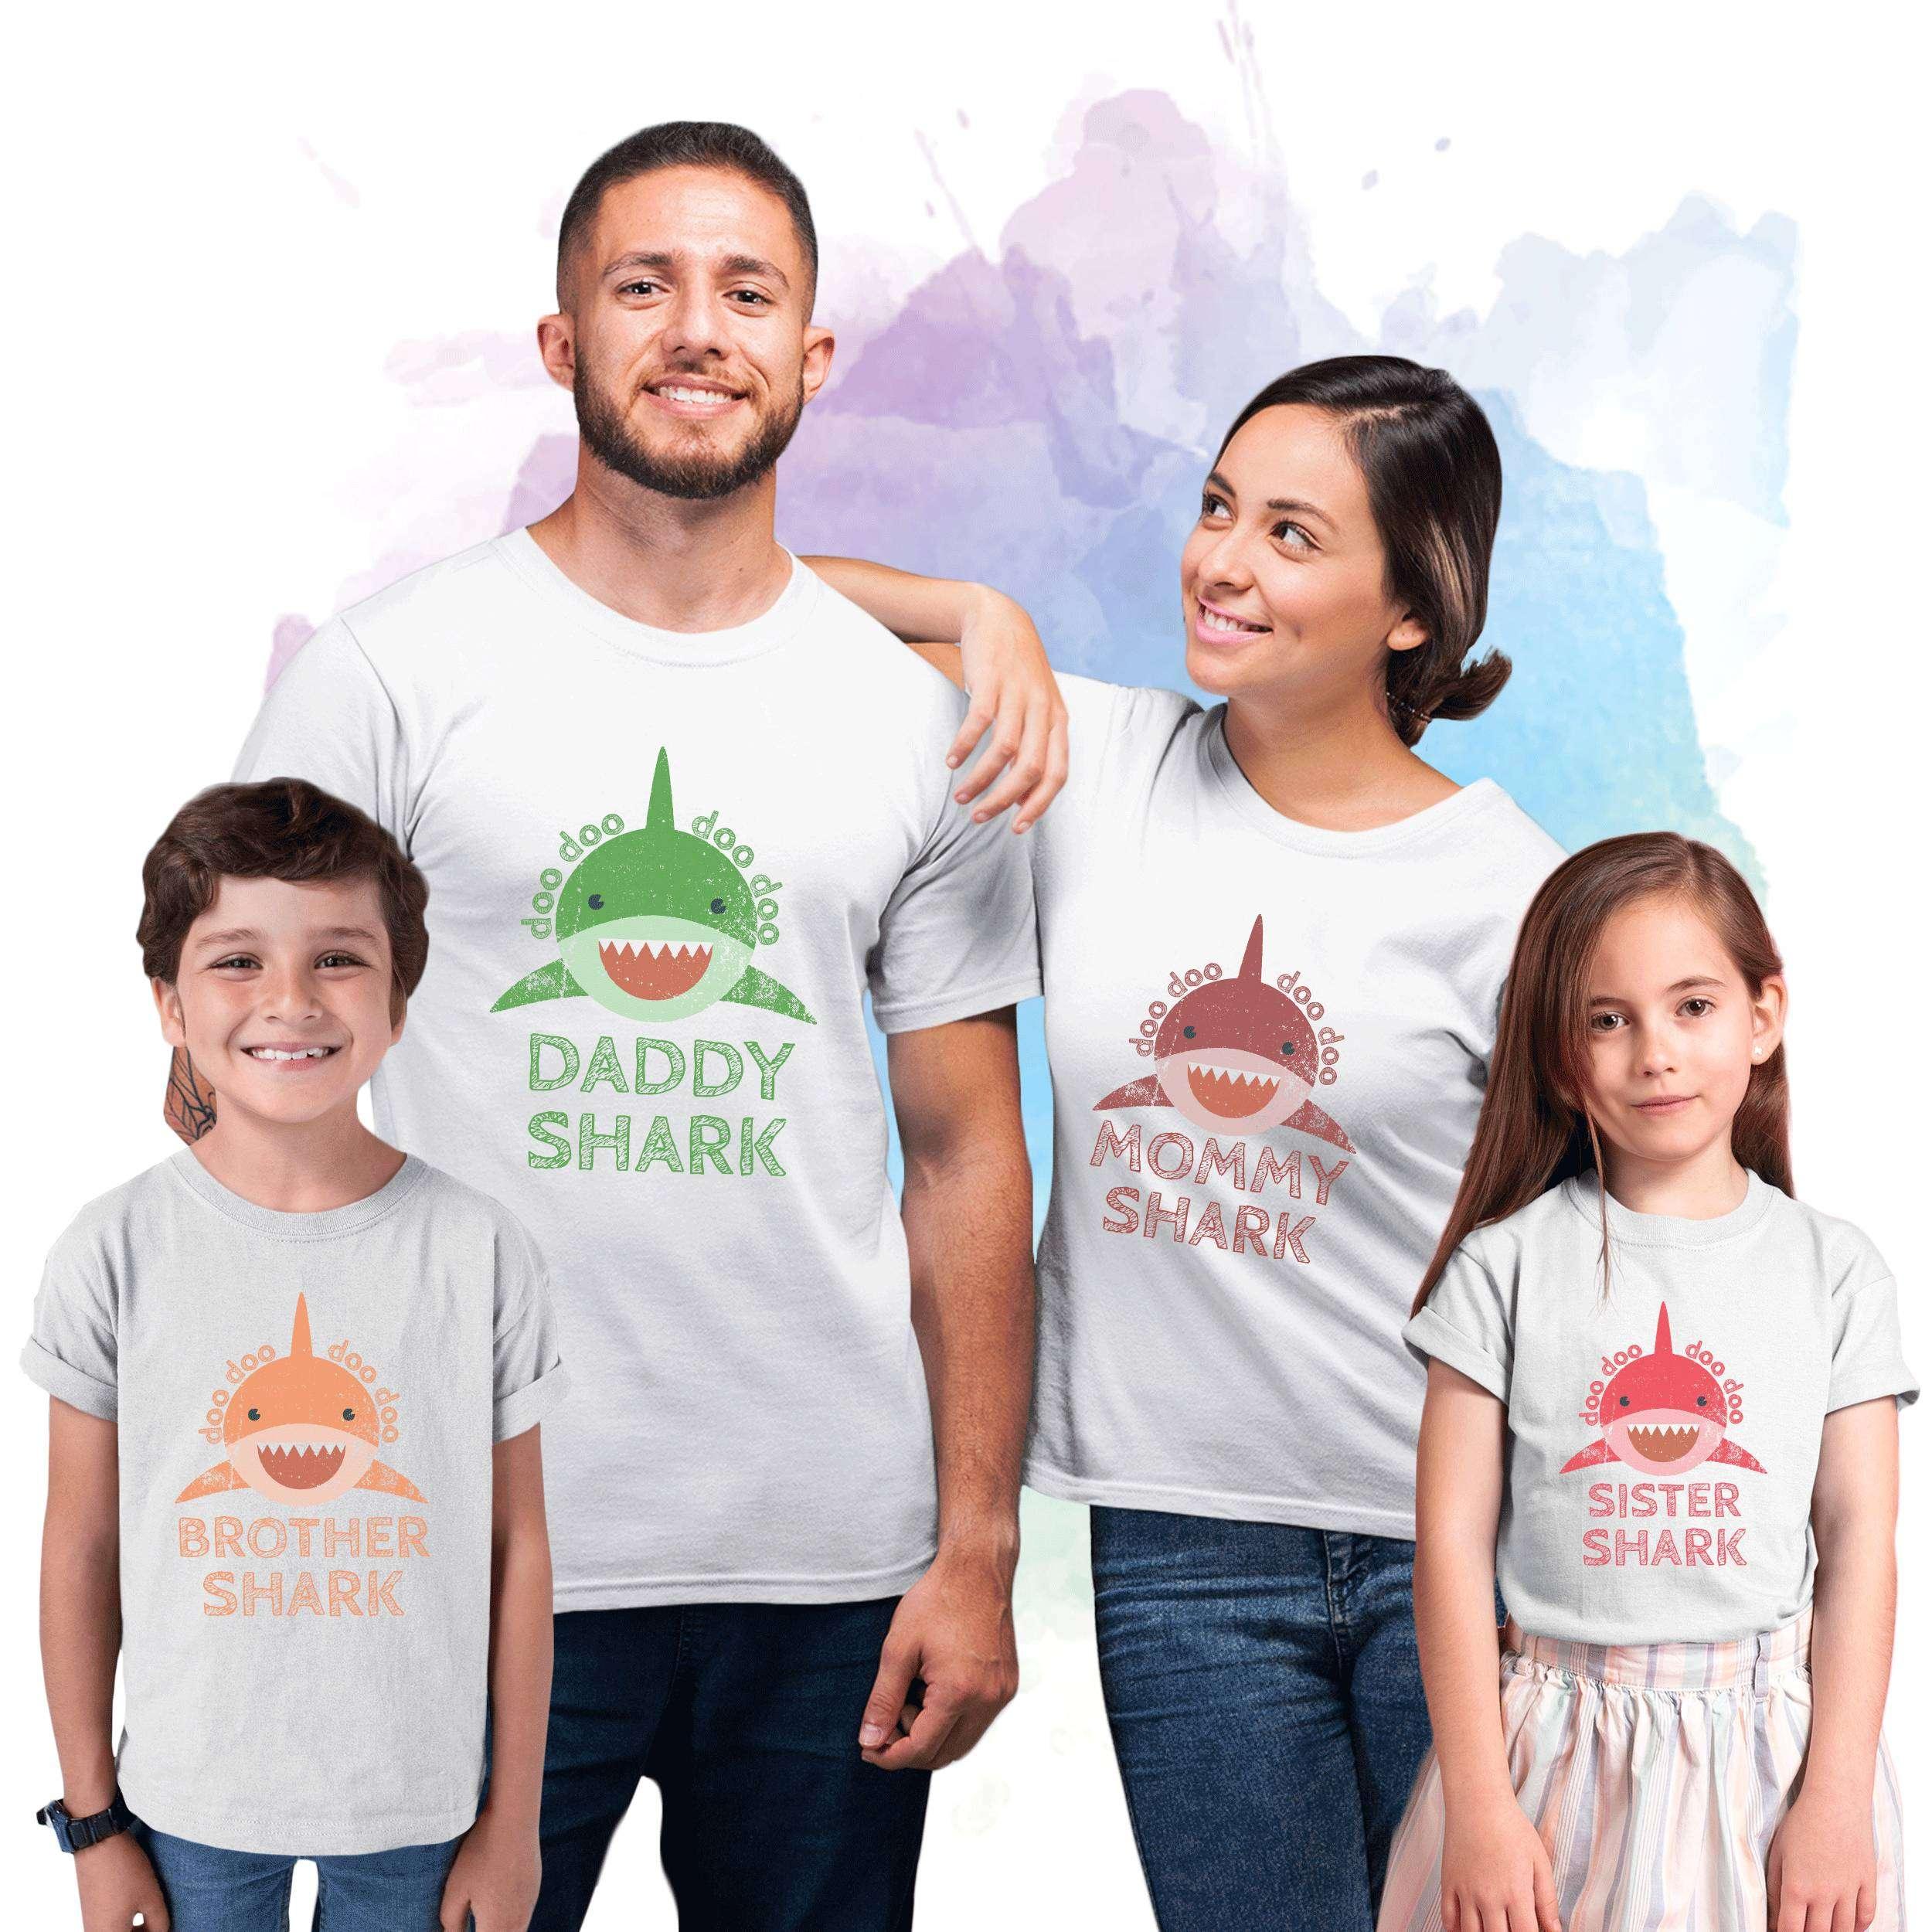 de10c525c Uncle Shark Baby Shark Aunt Shark, Family Sharks, Family Shirts